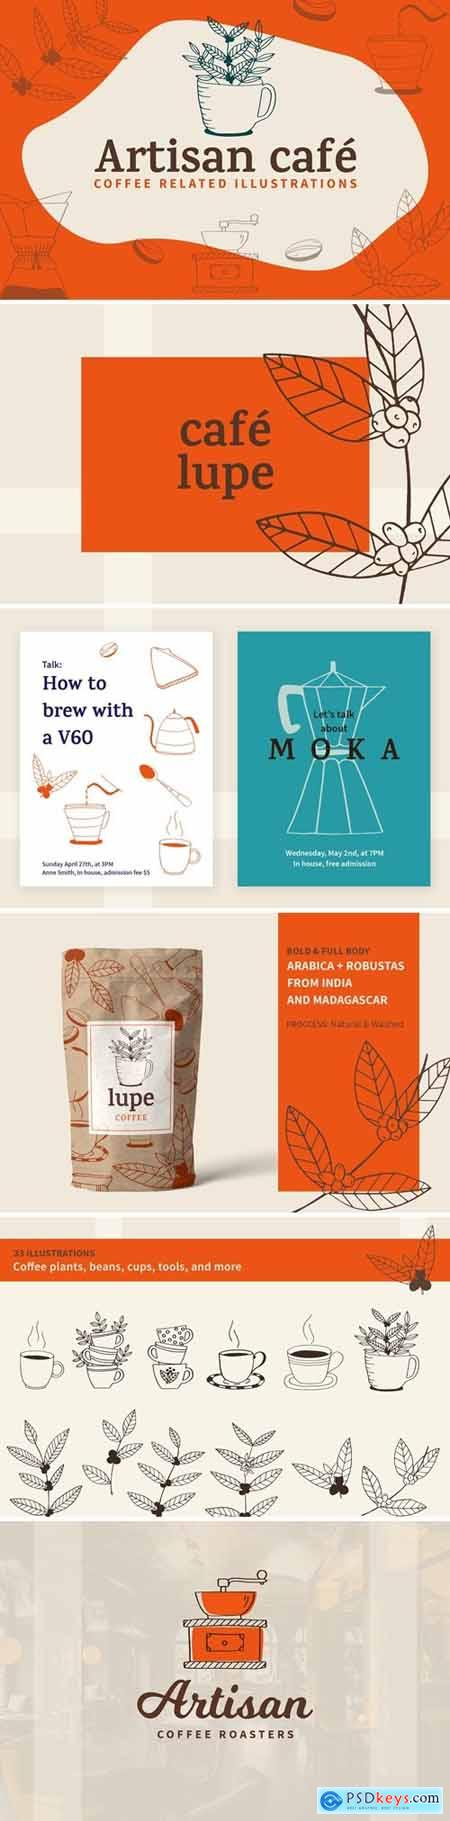 Artisan Cafe illustrations 3492076